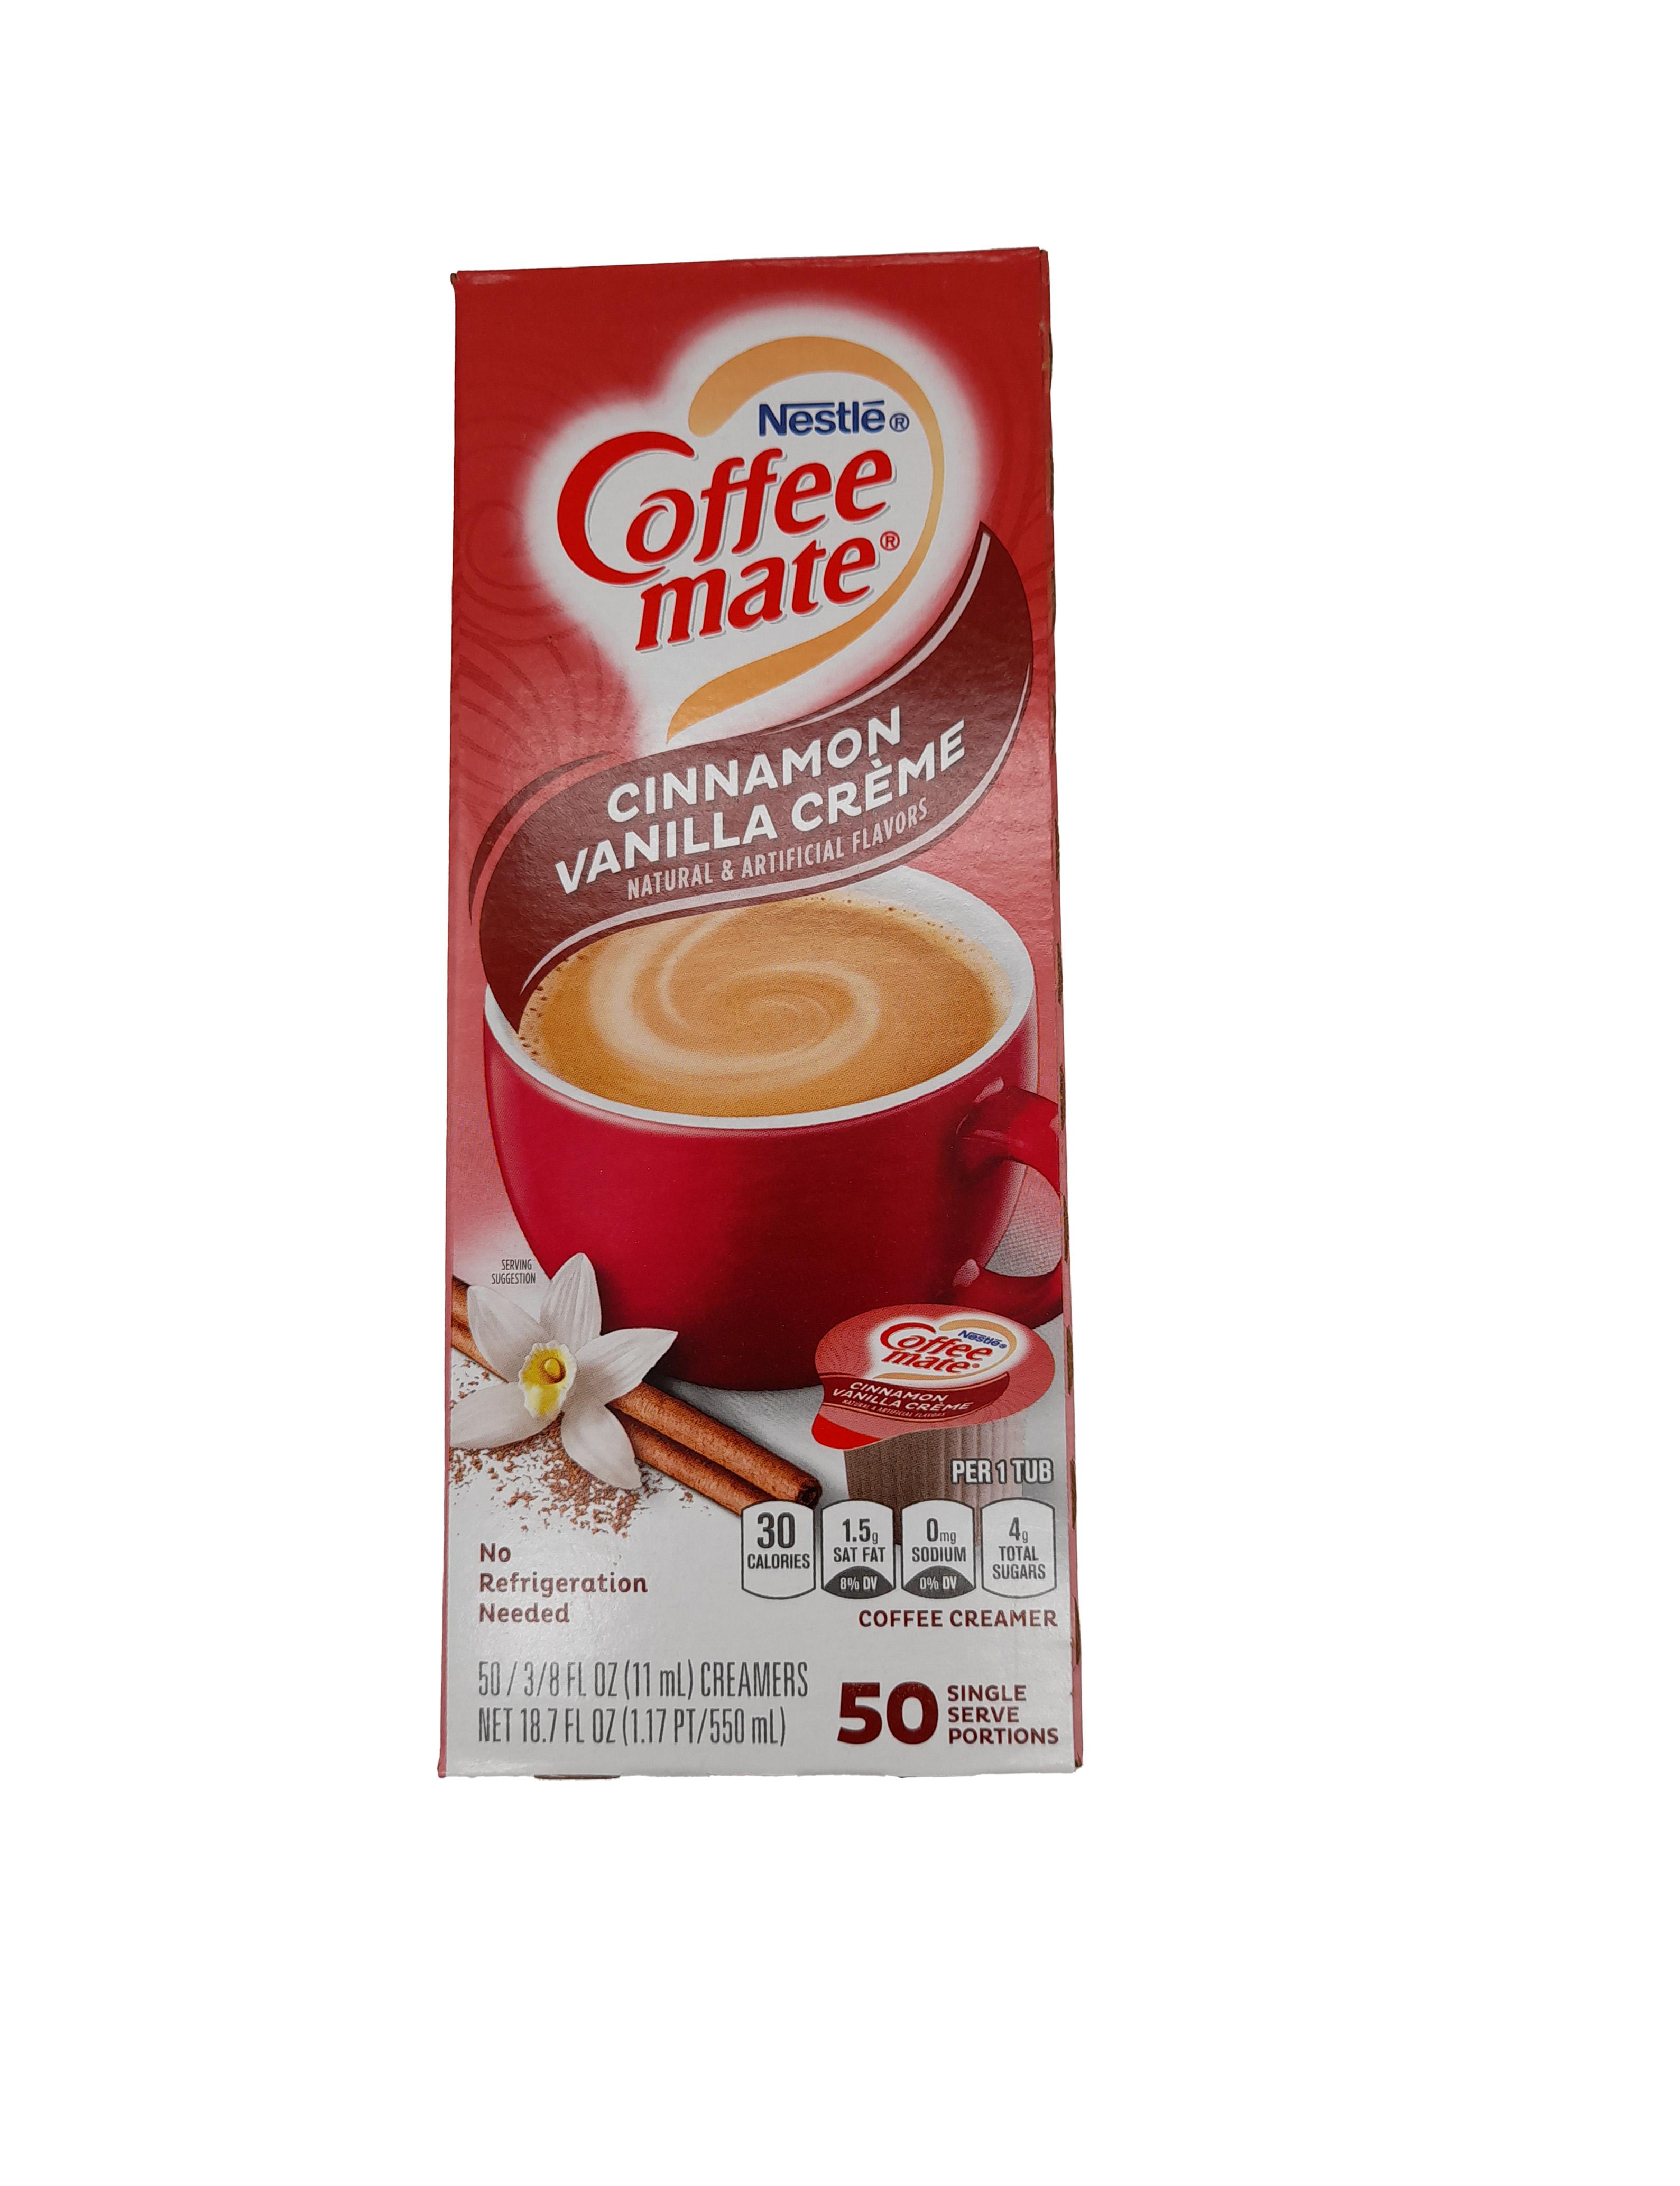 Nestle Coffee Mate Liquid Cinnamon Vanilla Creme Coffee Creamer 50x11ml (550ml)